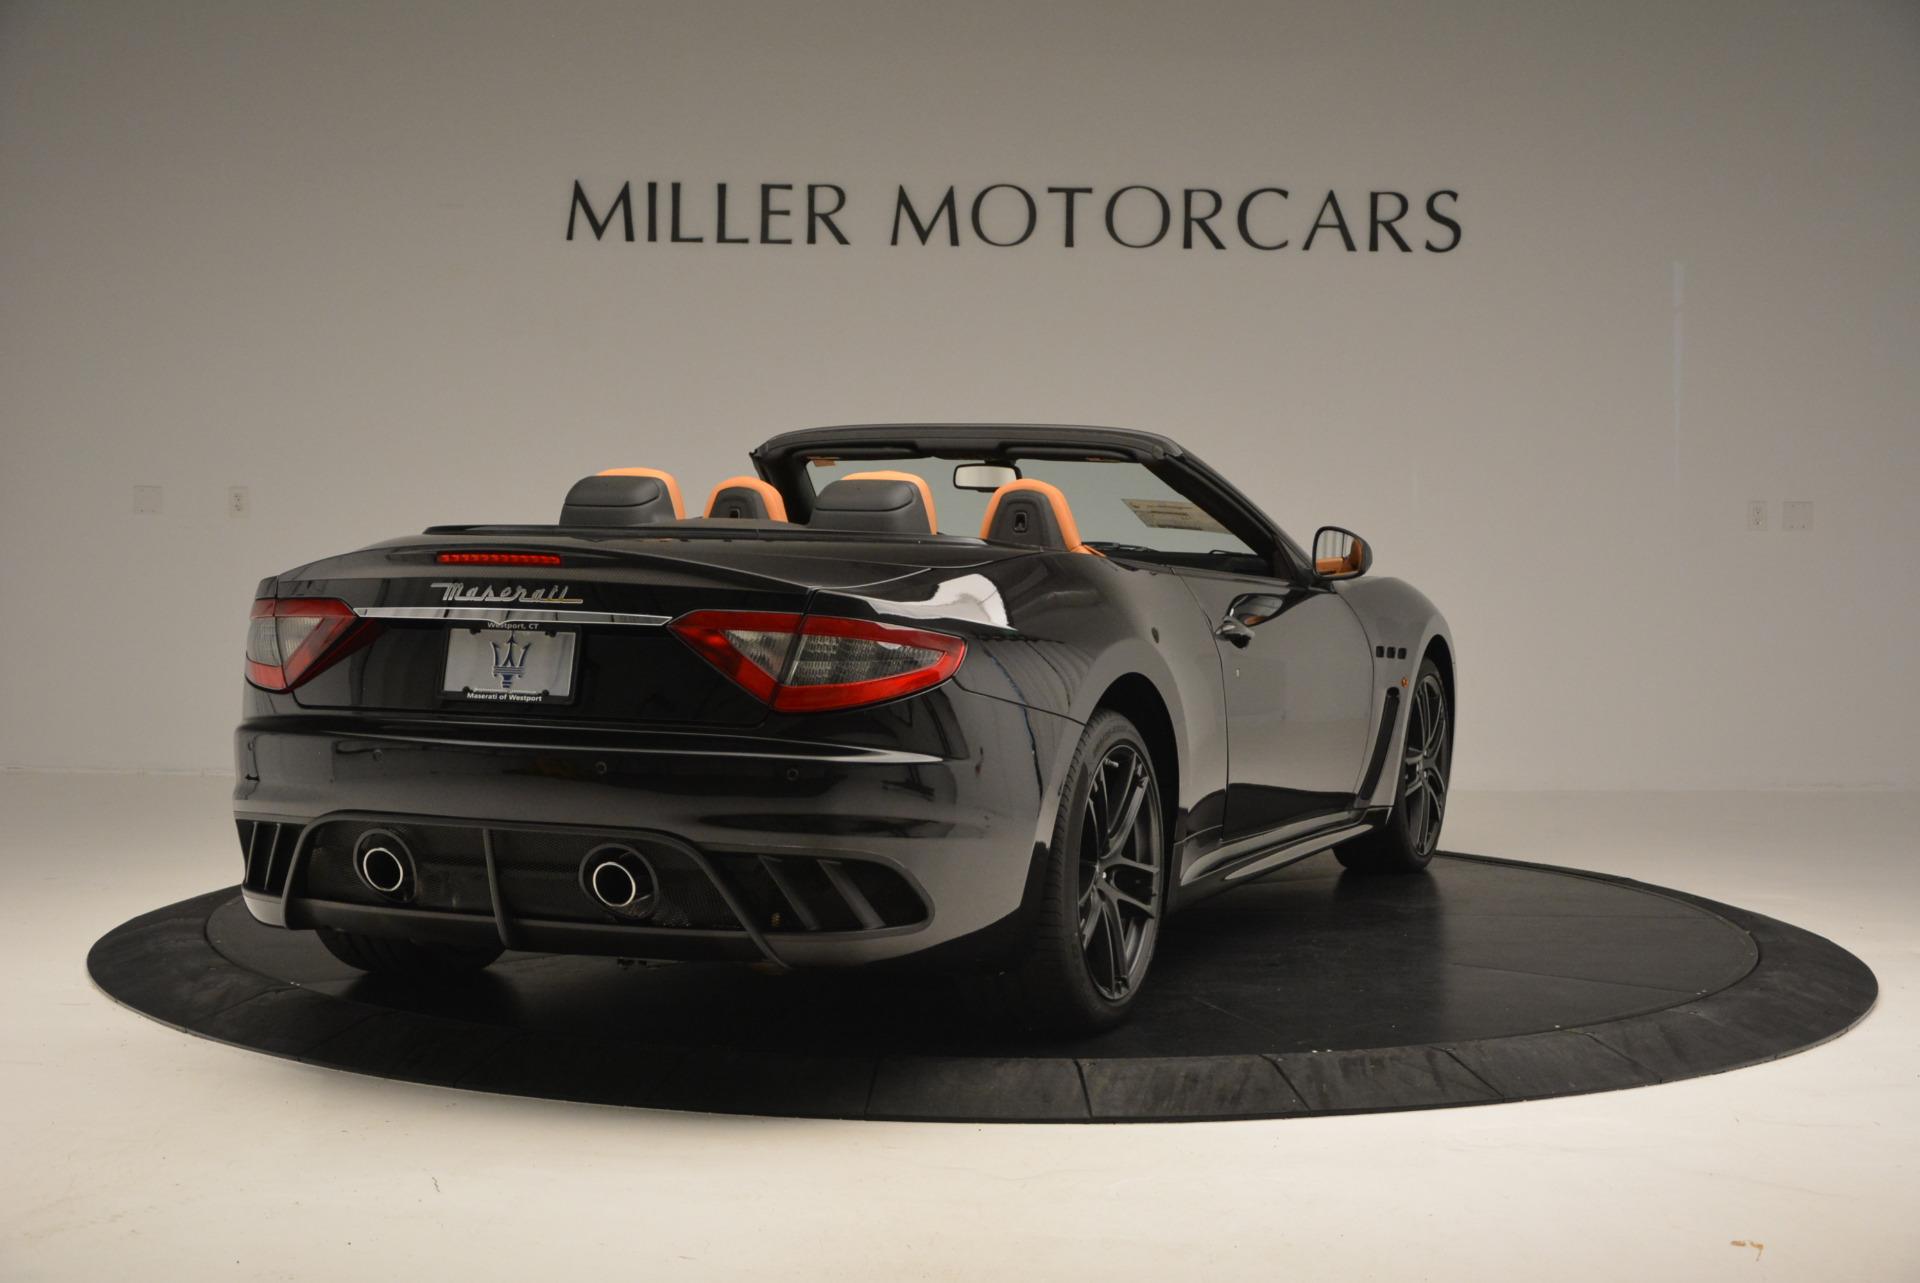 New 2017 Maserati GranTurismo MC CONVERTIBLE For Sale In Westport, CT 596_p7